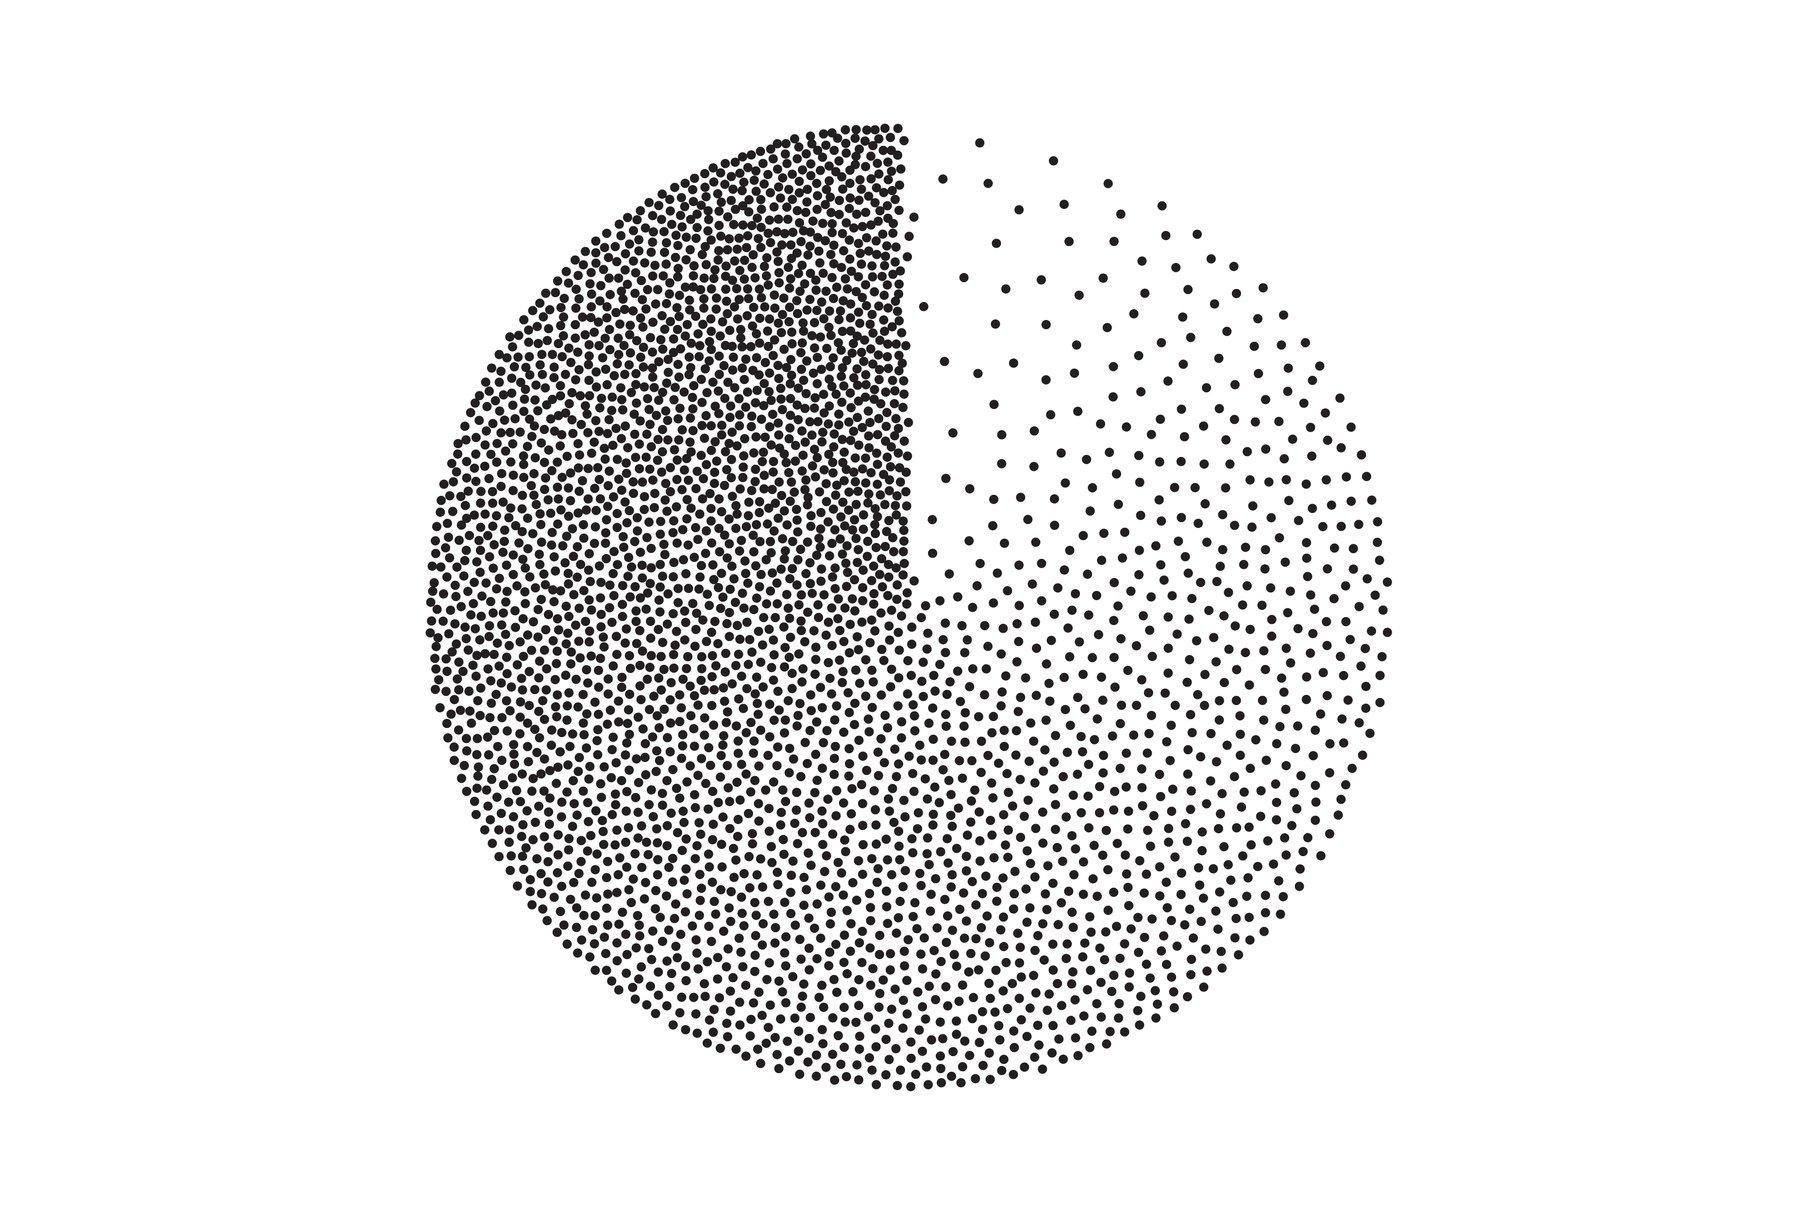 Abstract Geometric Shape Vector. Film Grain, Noise example image 1